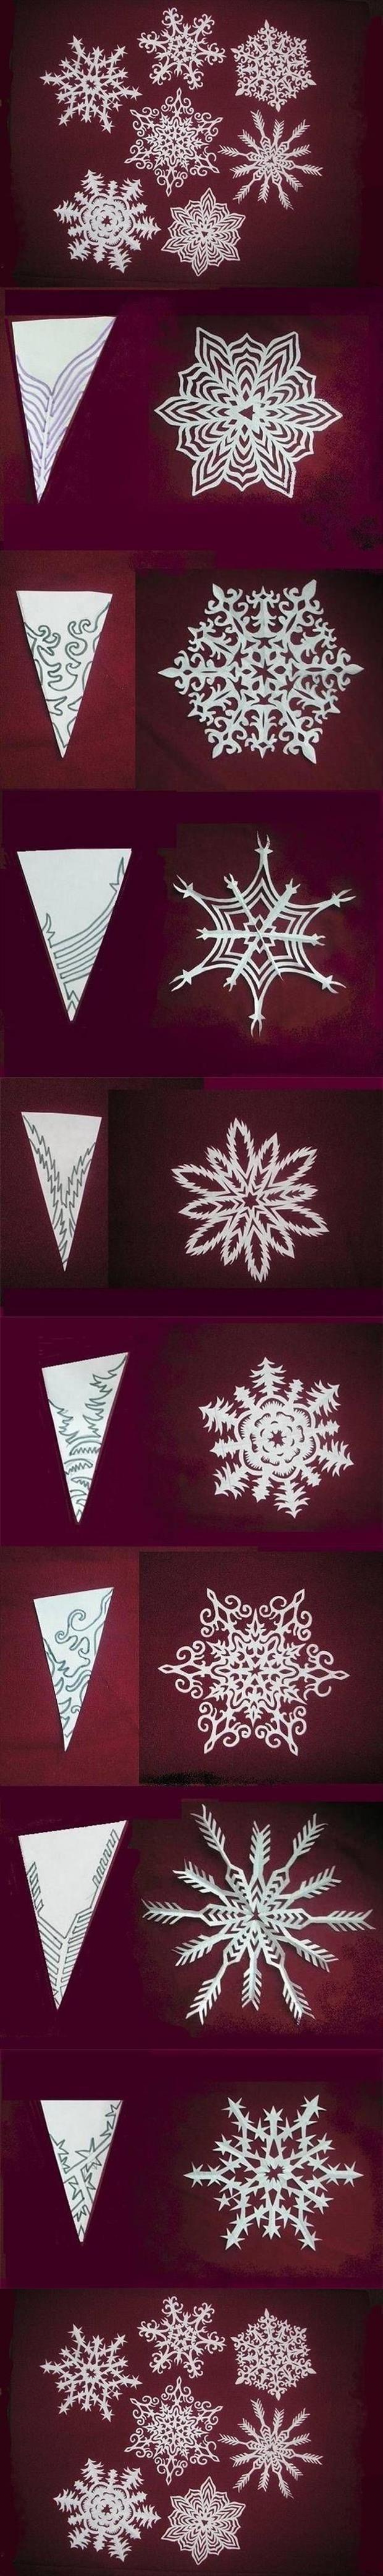 25 unique Snowflake craft ideas on Pinterest  Paper snowflakes